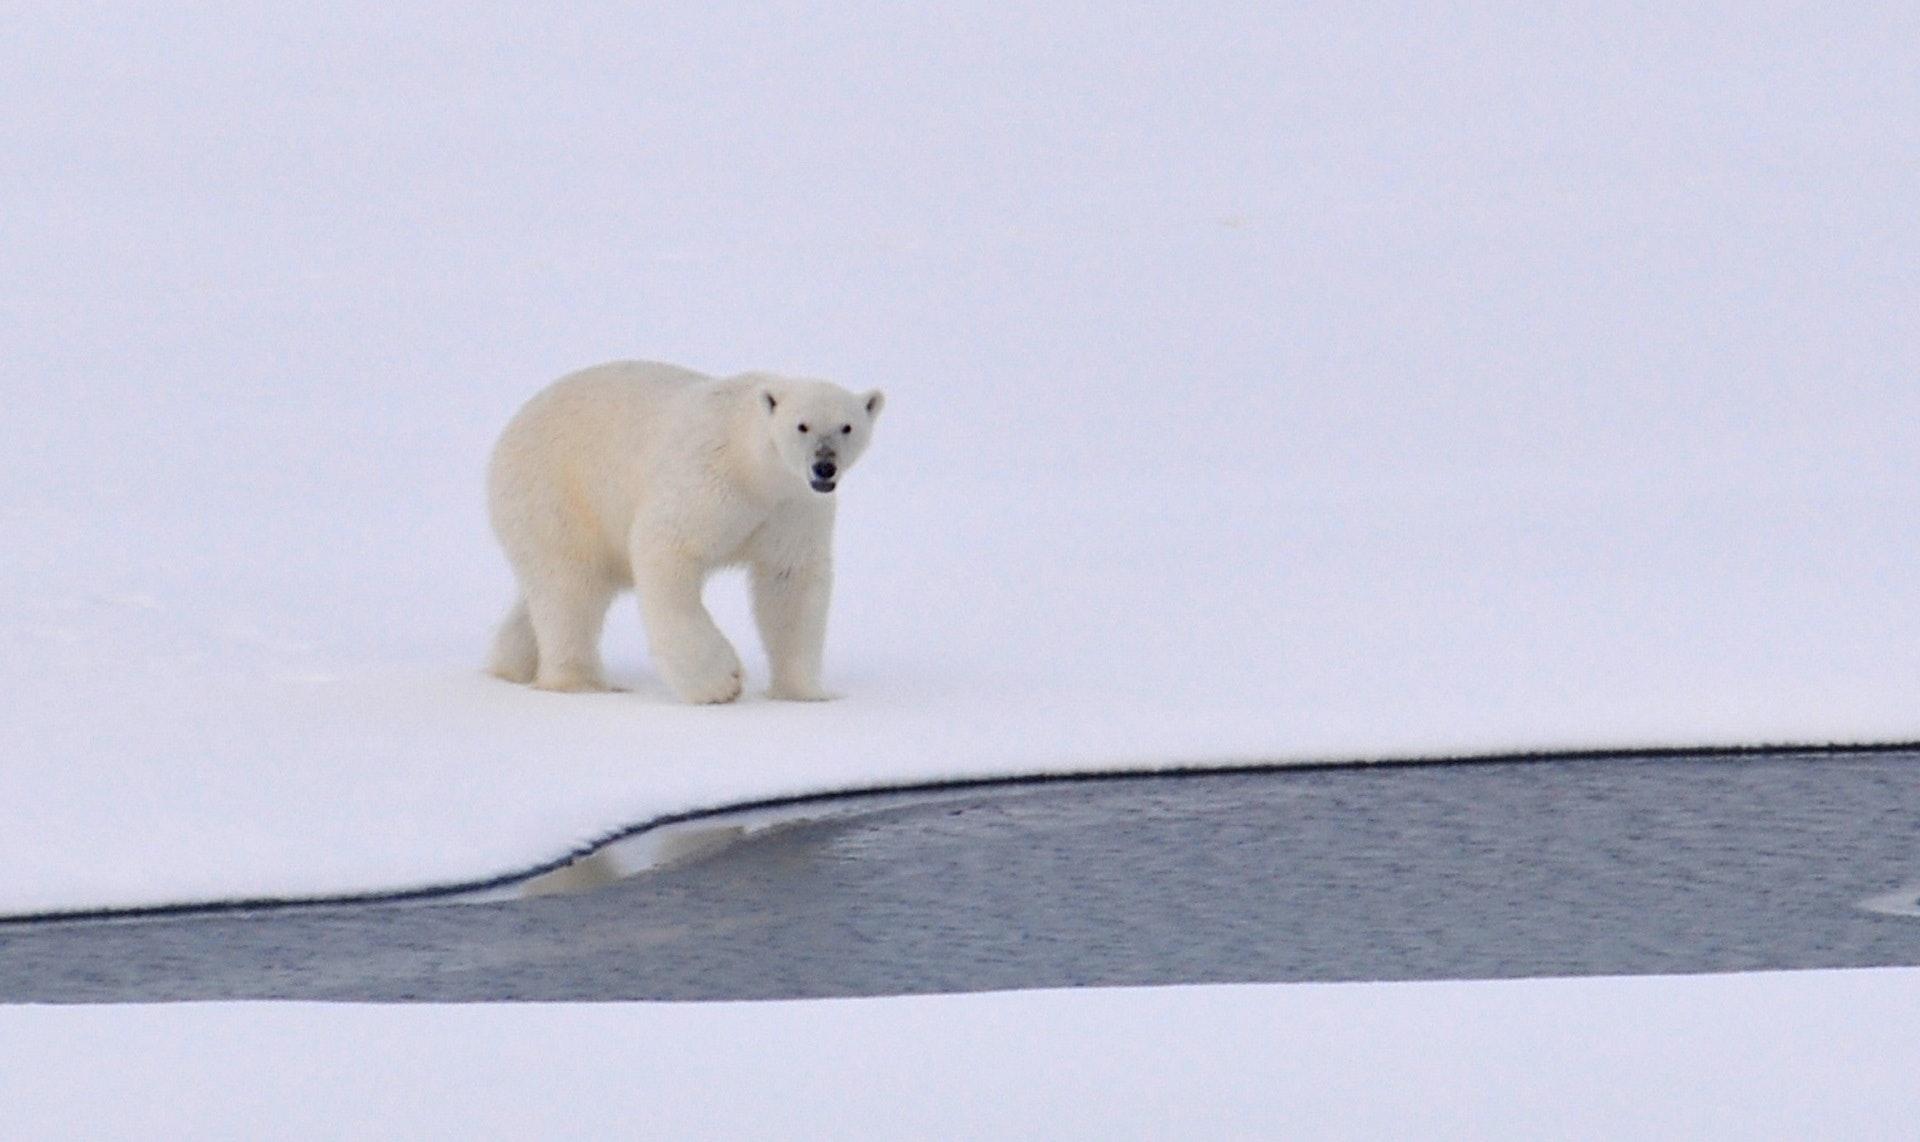 Un oso blanco